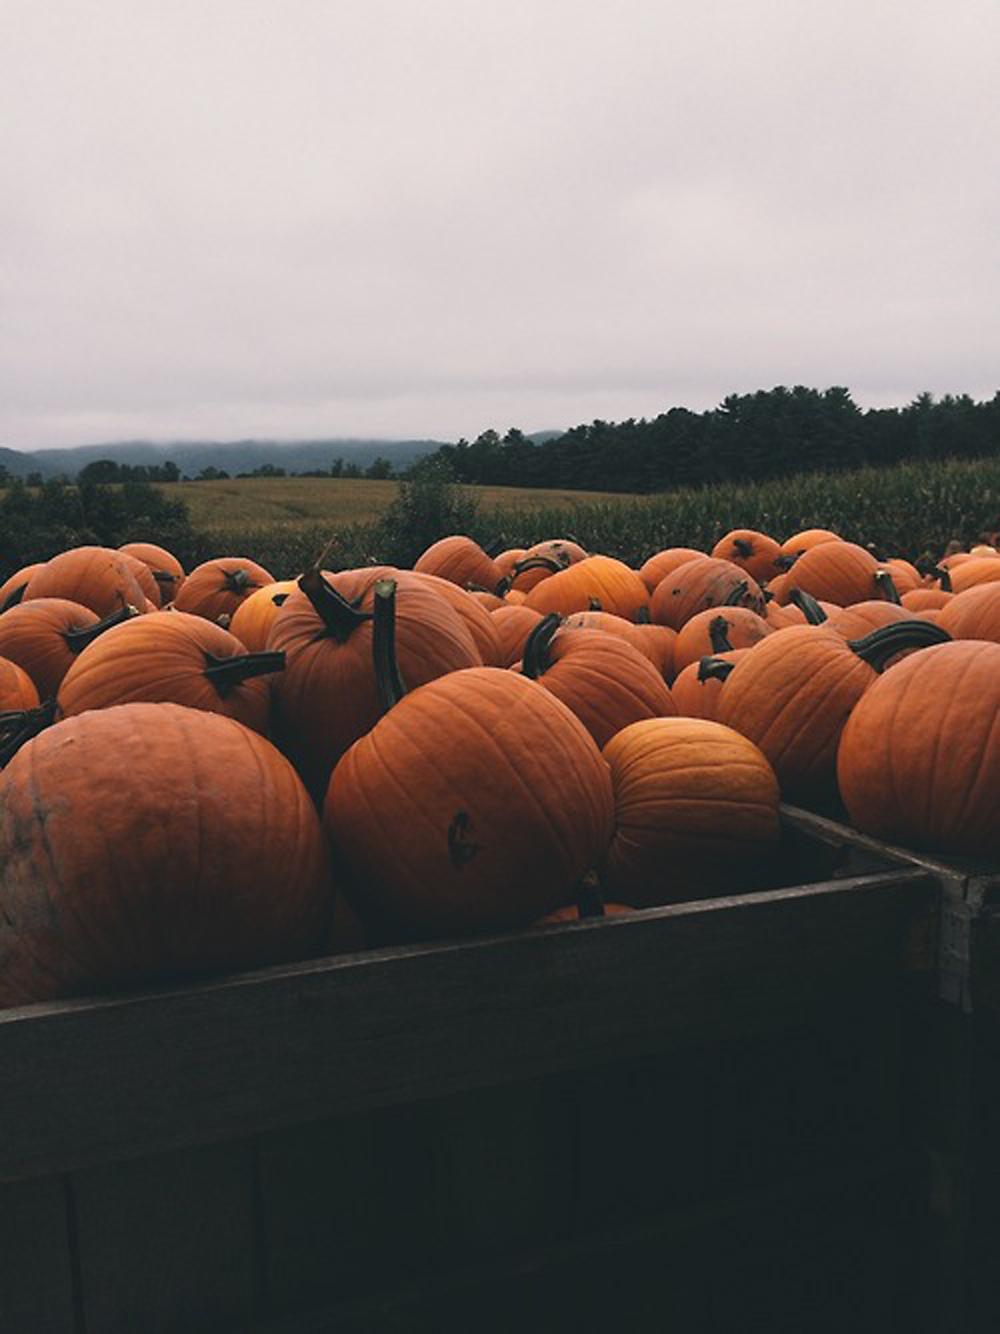 pumpkins preferably self picked pumpkins are a must - via  tumblr